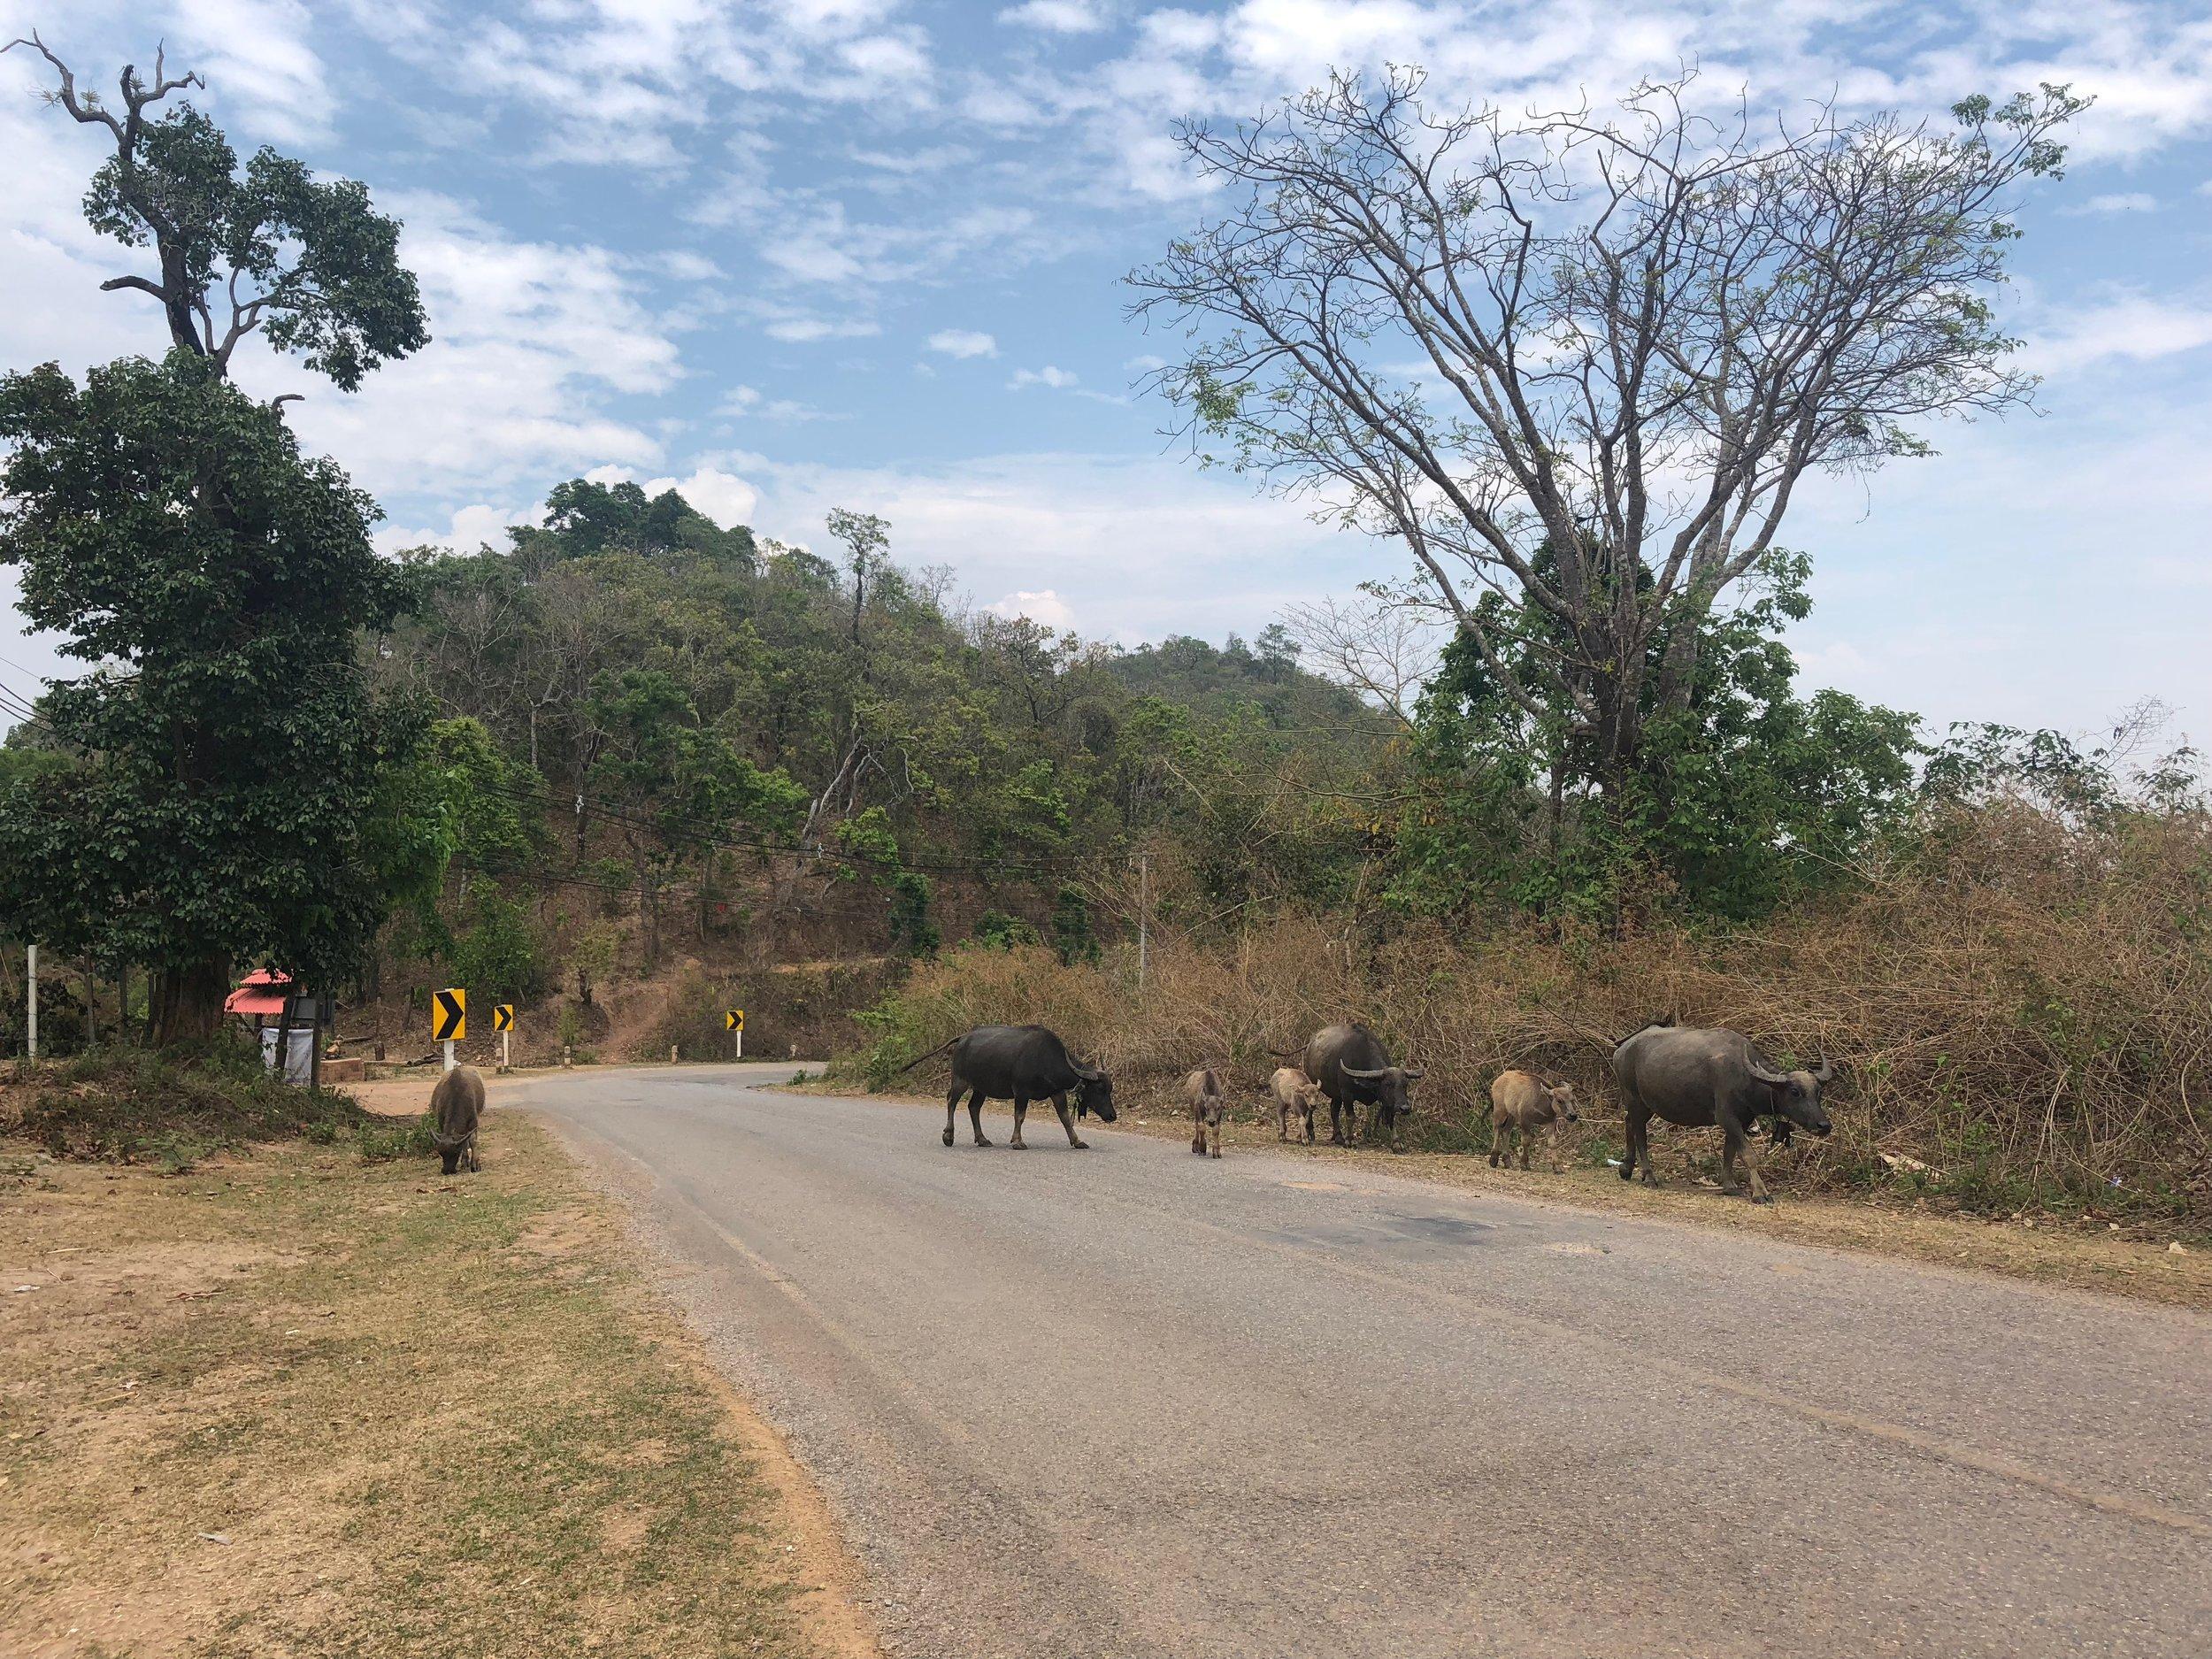 Water buffalo along the road